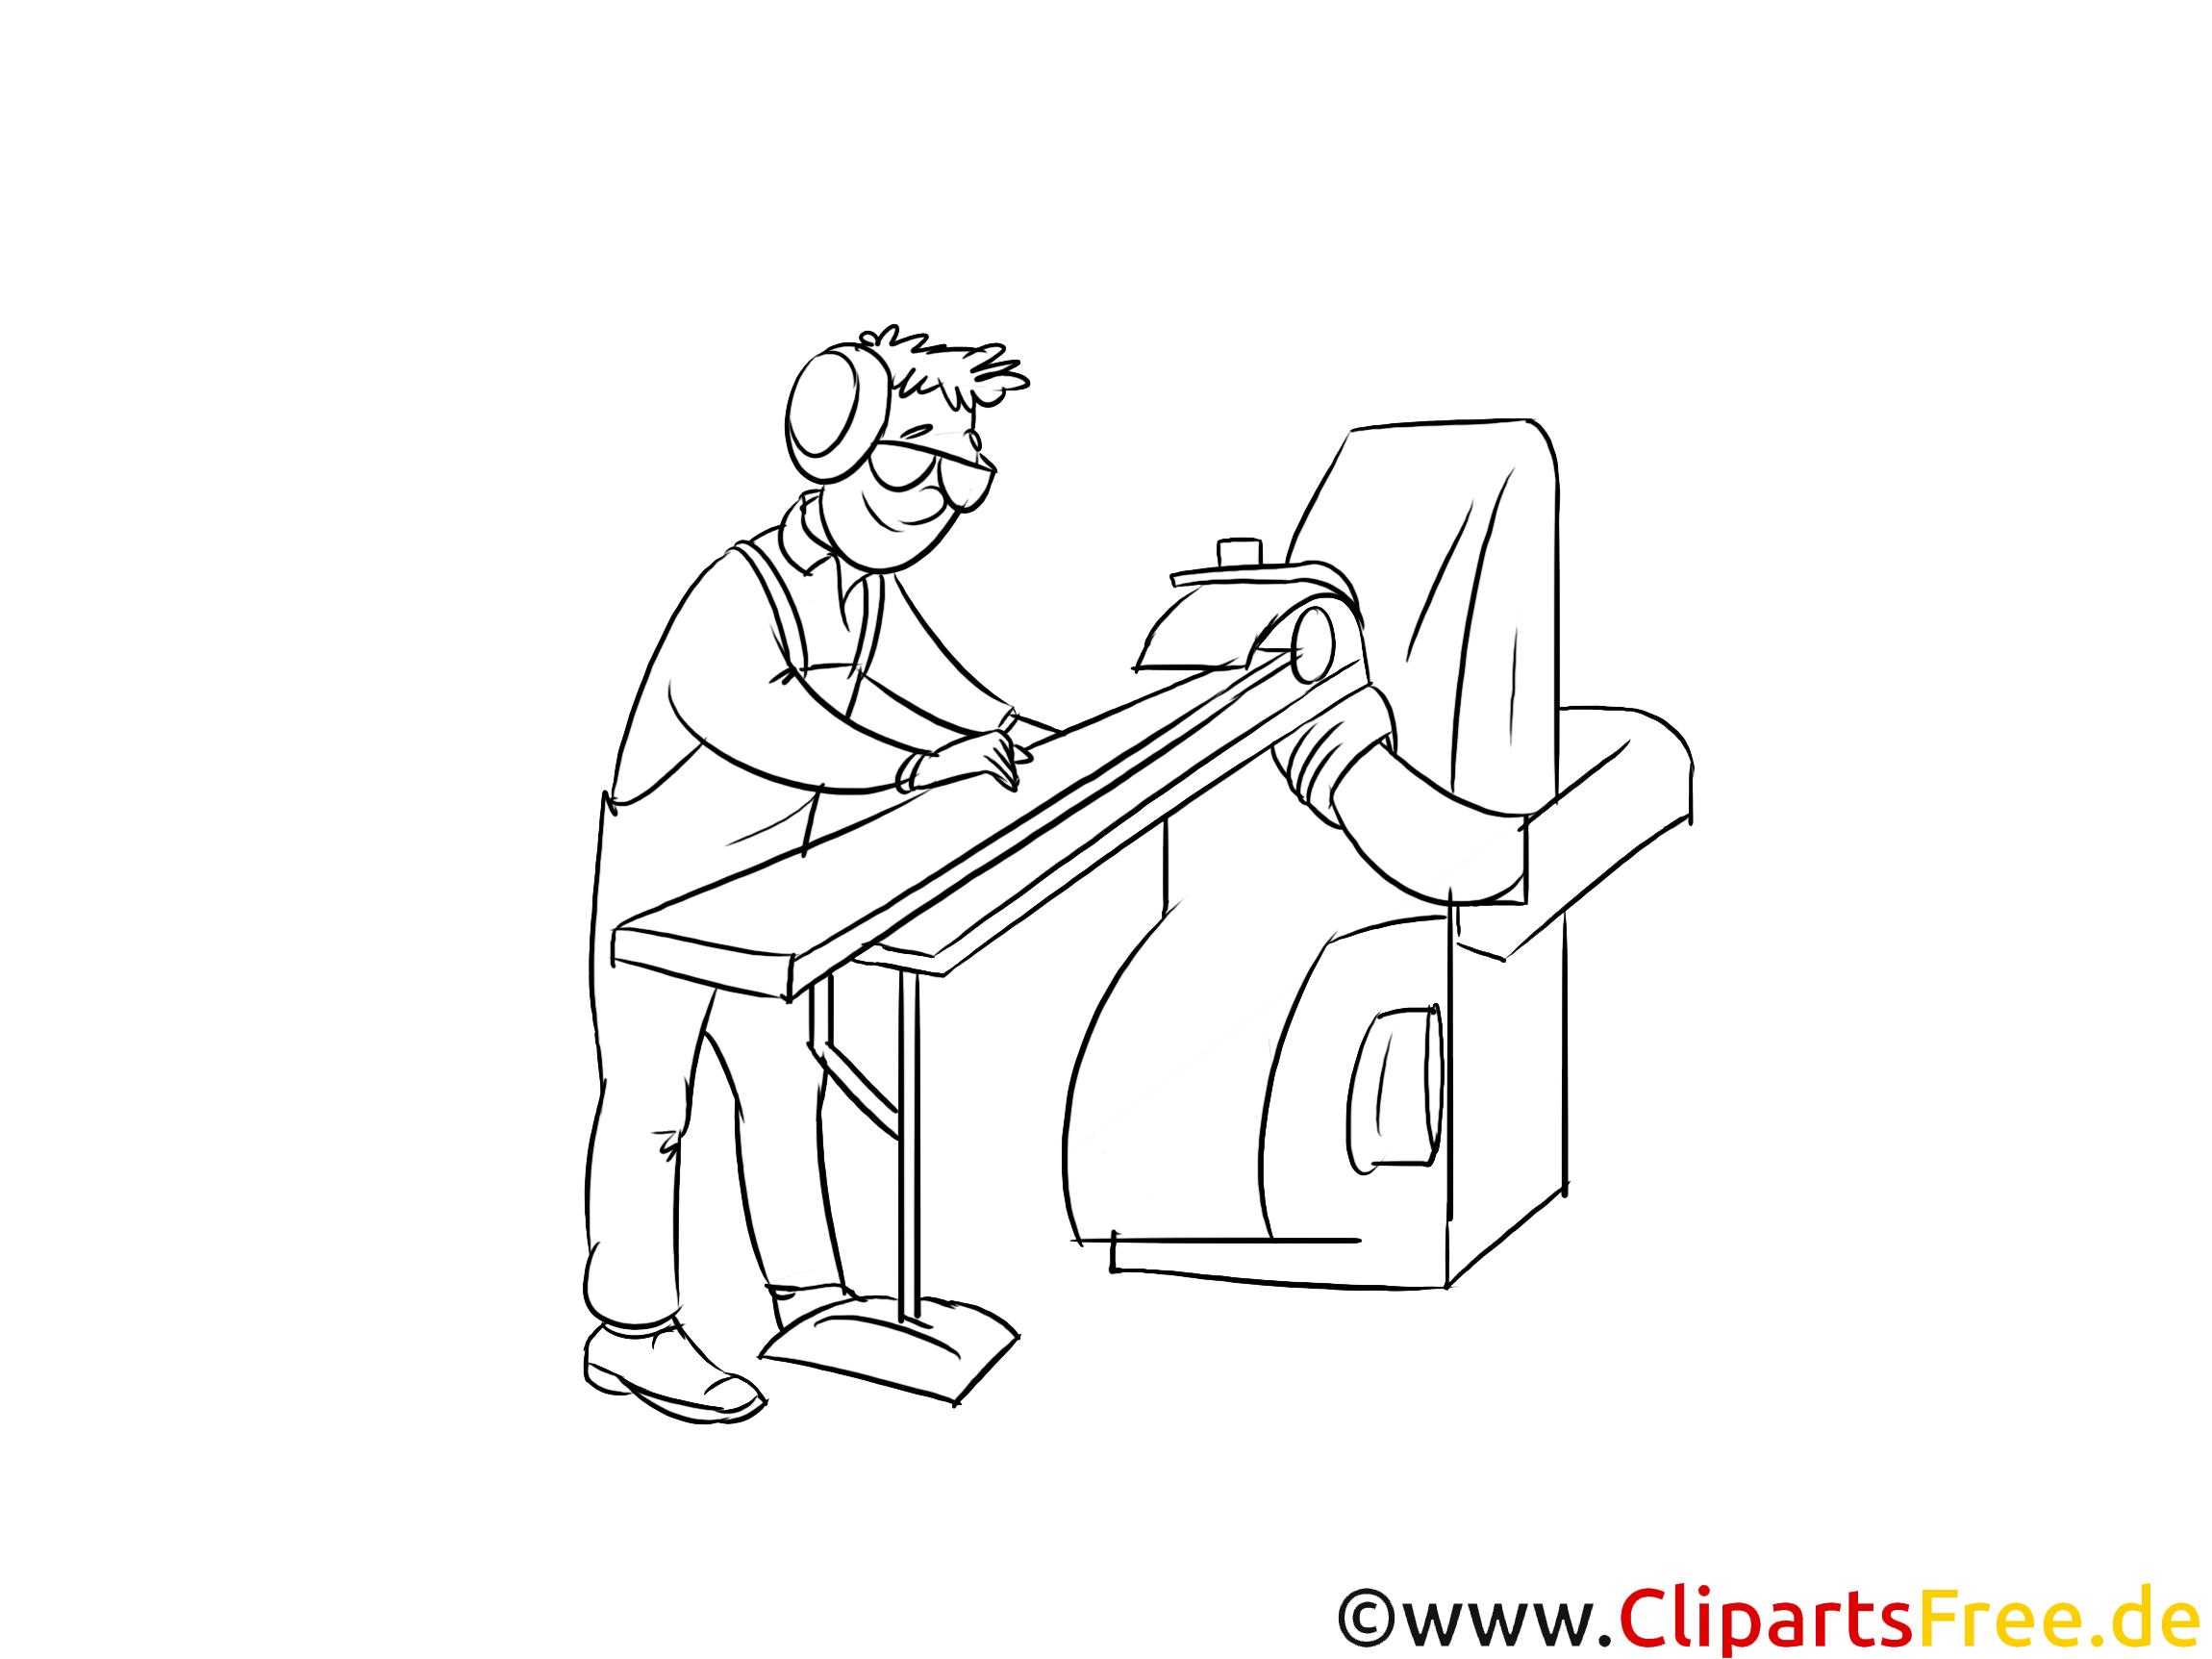 Holzmechaniker Clipart, Grafik, Bild schwarz-weiß